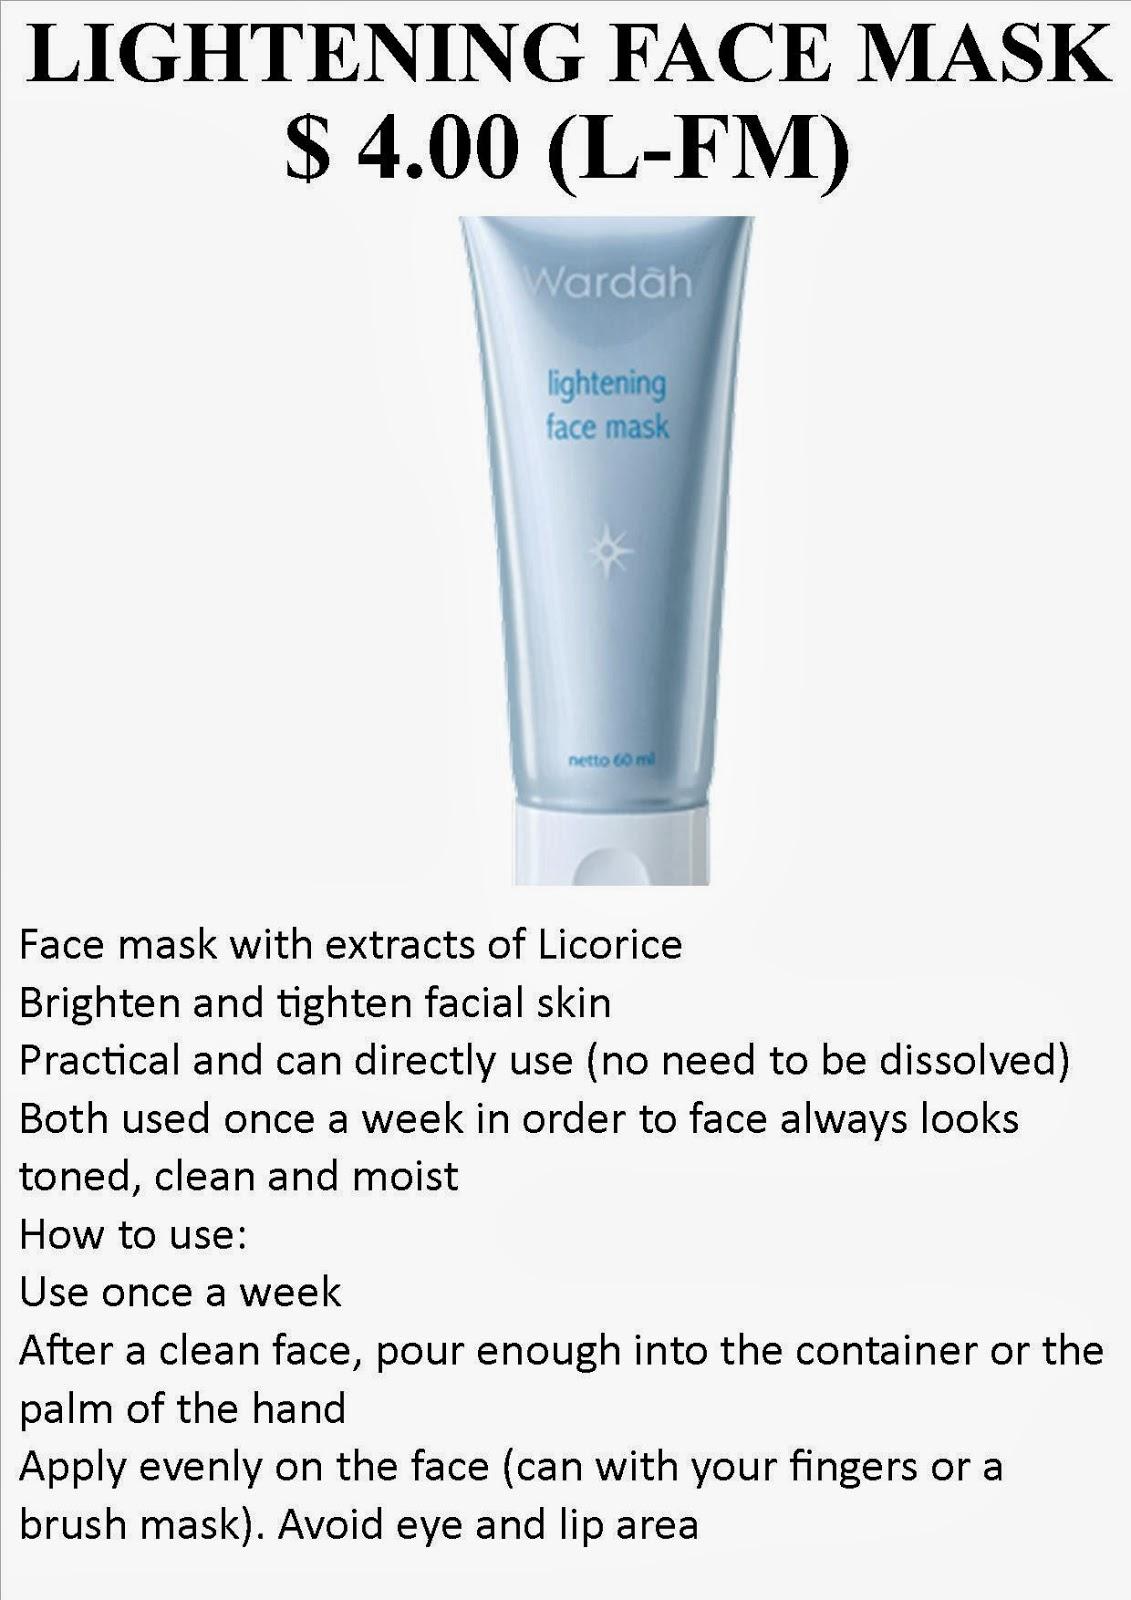 Ana Stovia Google Wardah Lightening Face Mask